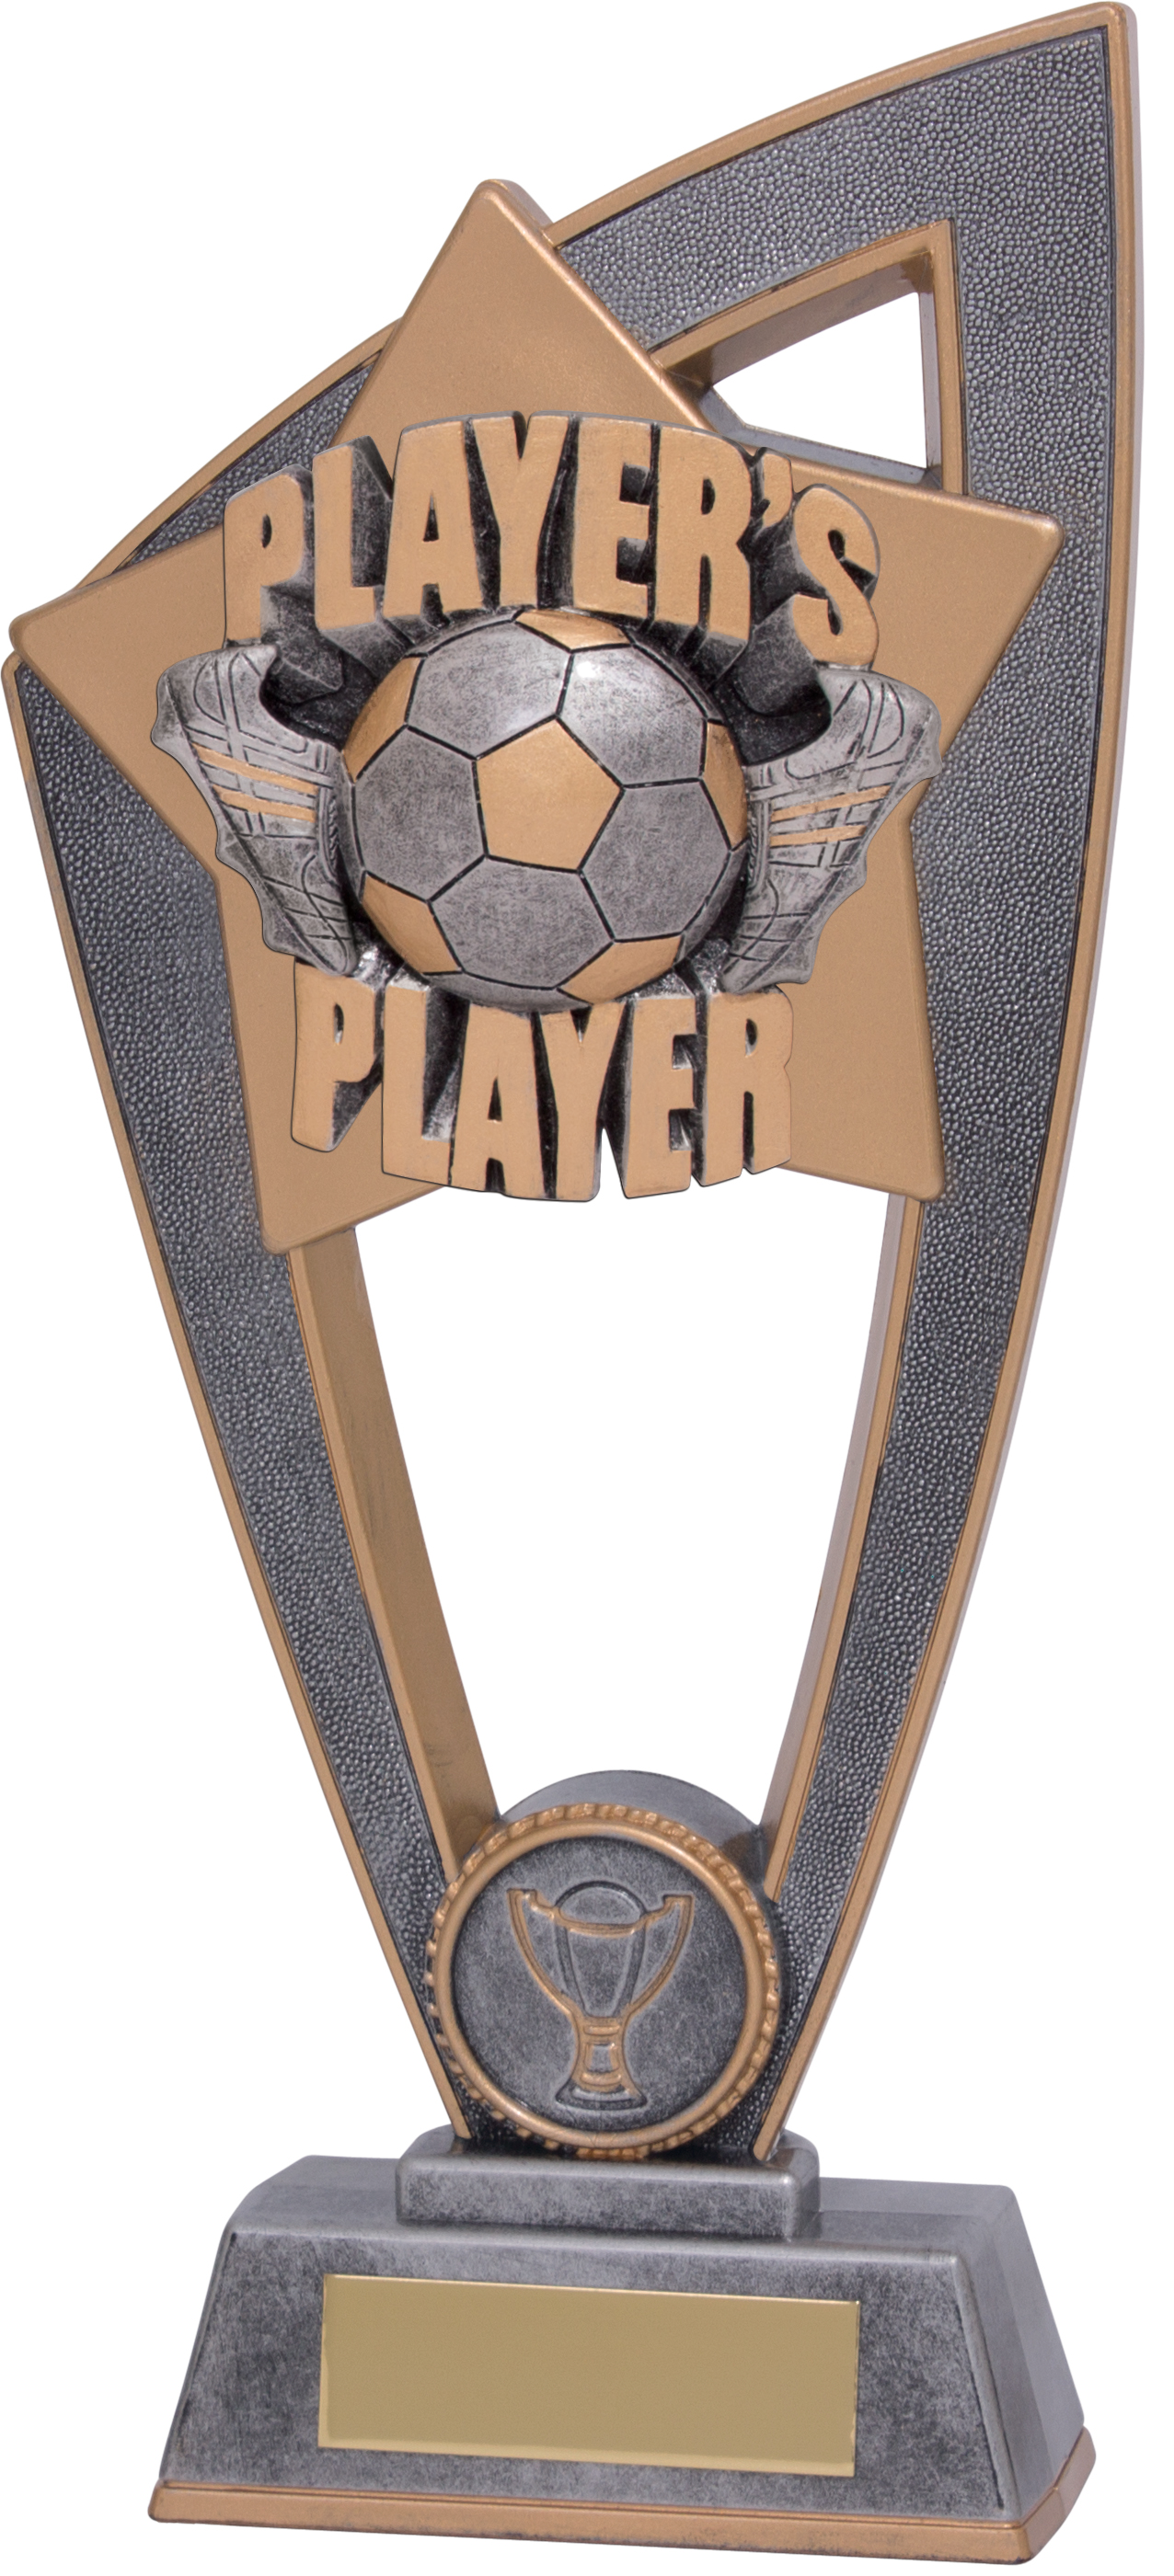 "Players Player Star Blast Trophy 23cm (9"")"